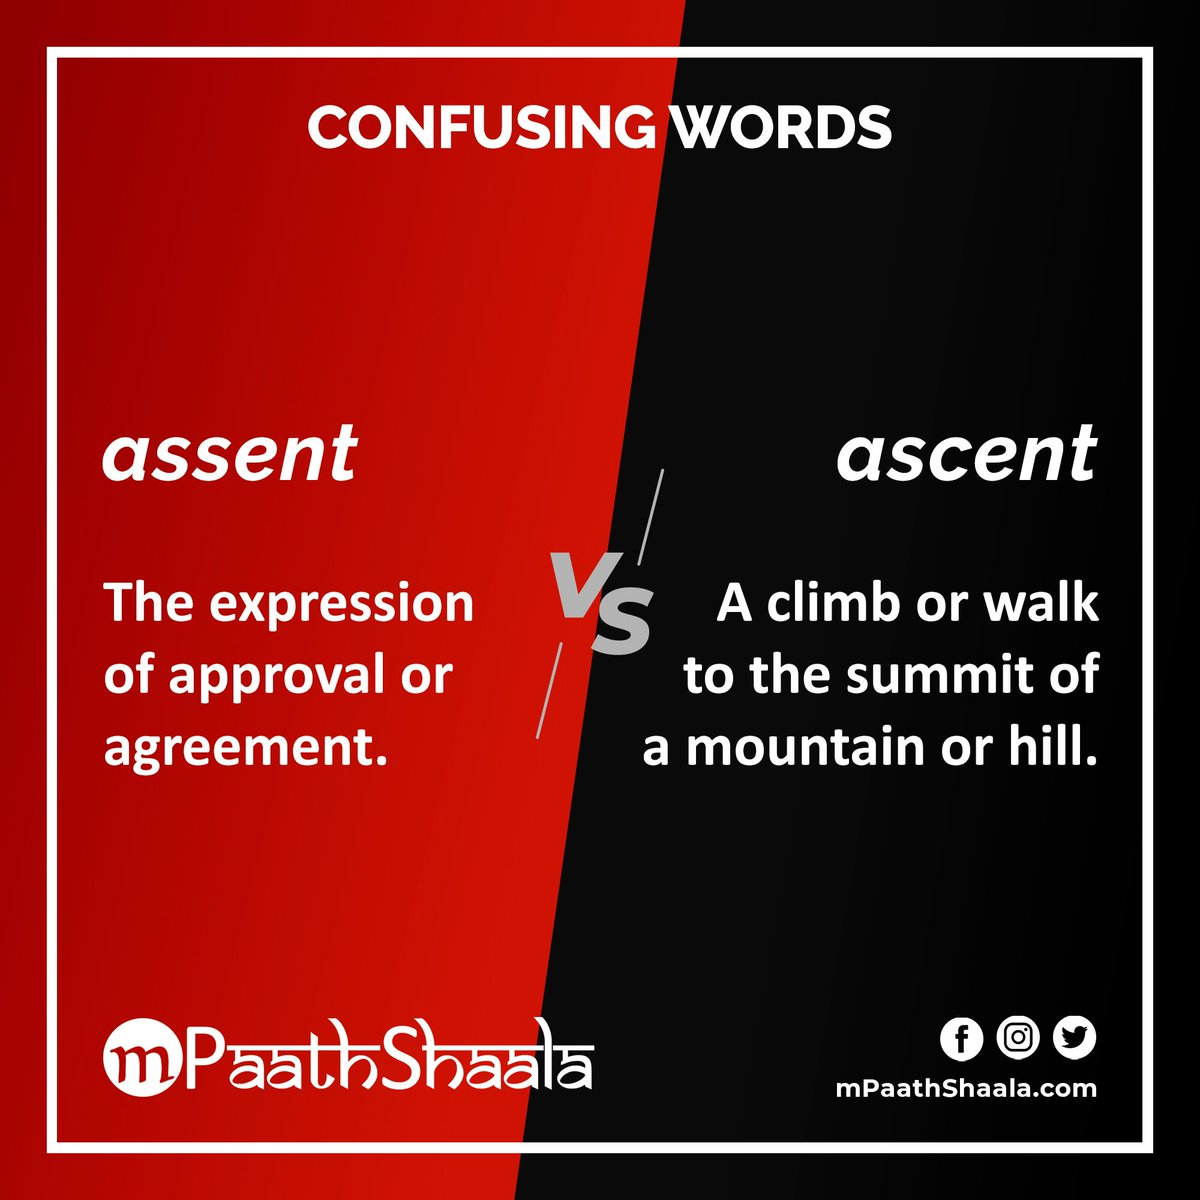 #ConfusingWords assent versus ascent . #Vocabulary #English #EnglishVocabulary #IELTS  #TOEFL #Words #Spelling #Learning #Education #WordNerd #Homophones #Homonyms https://t.co/Kh8ObLEzP9